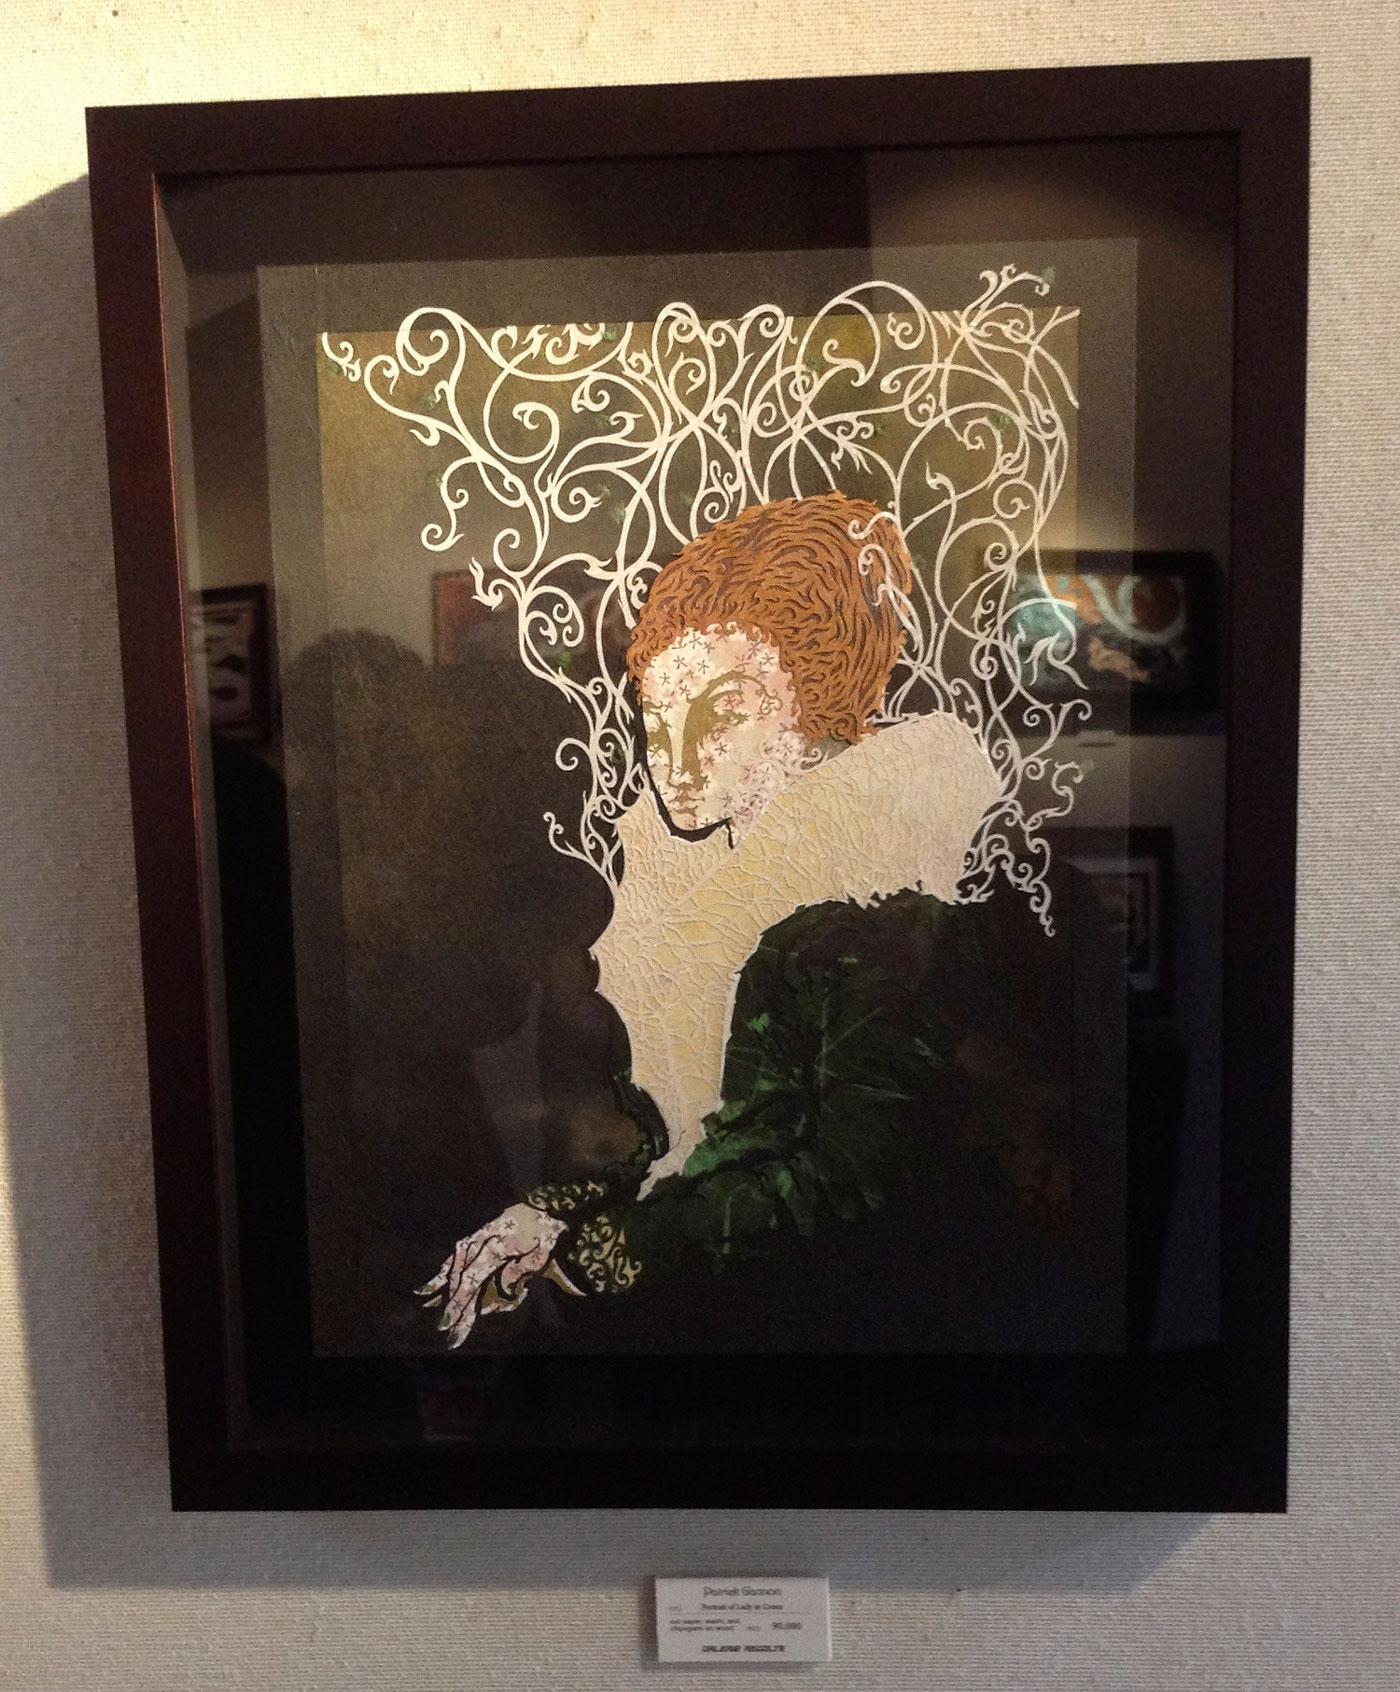 Portrait of Lady in Green, framed